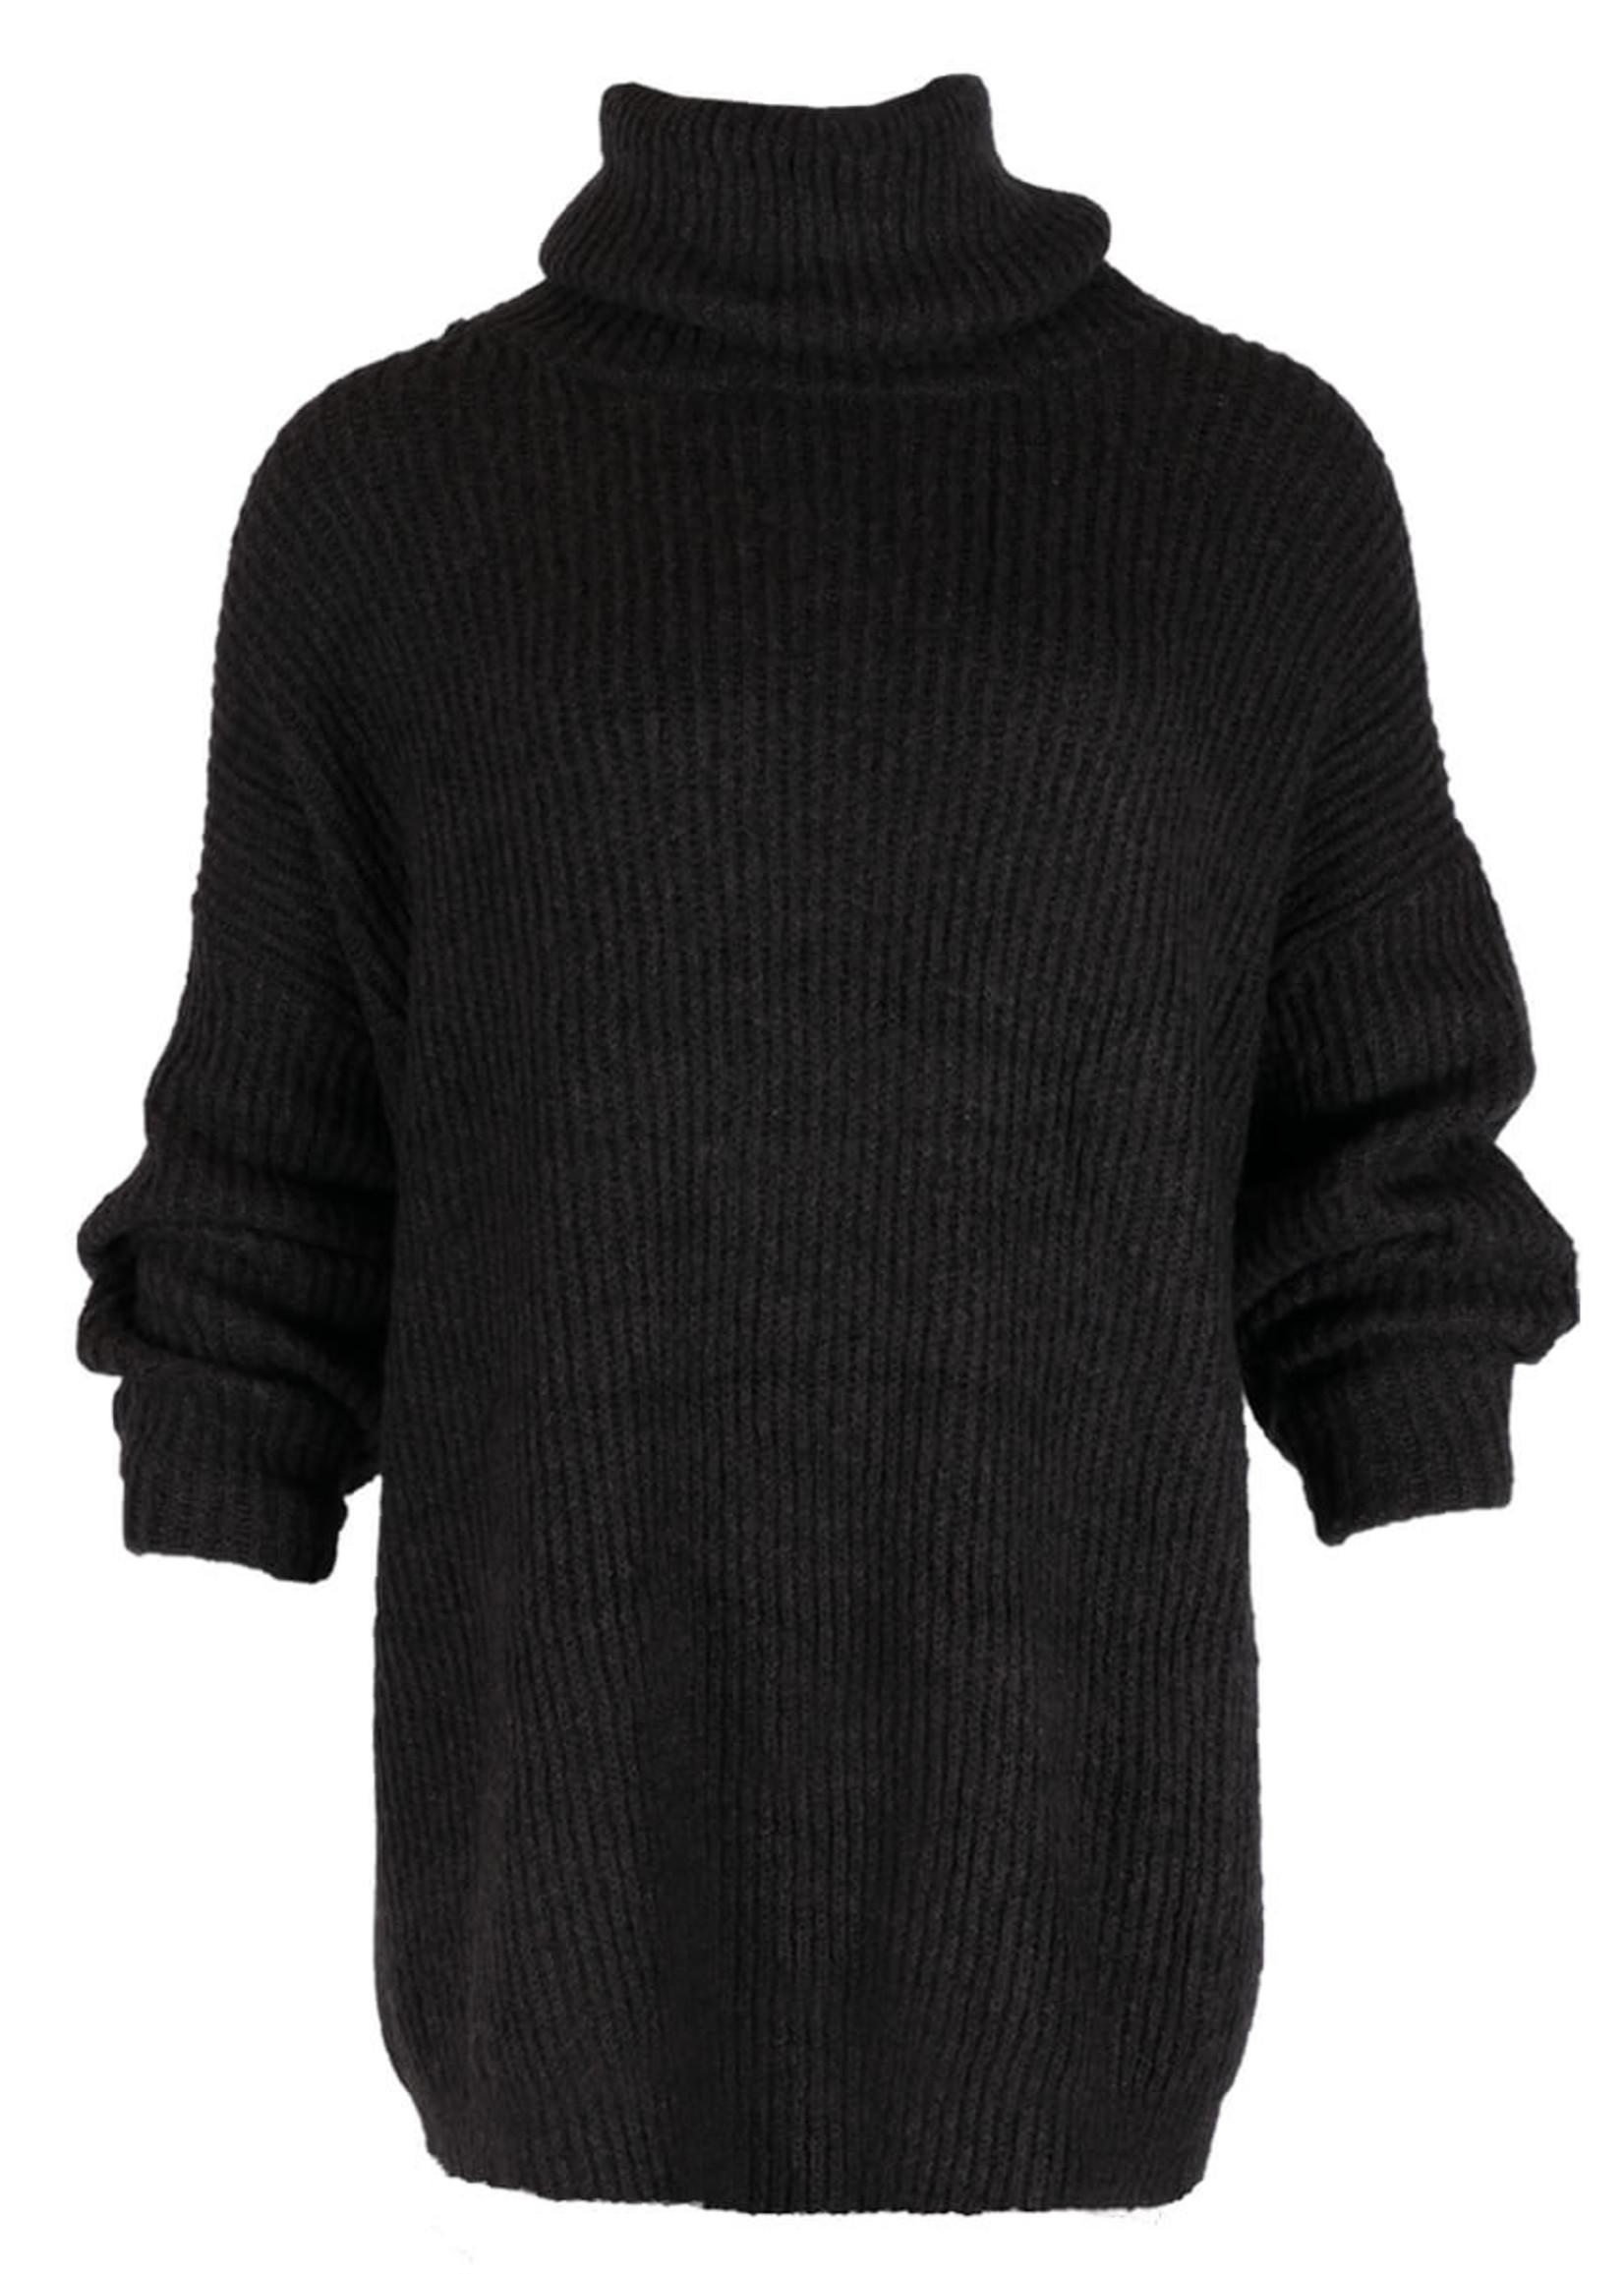 Lovely Knitted Pull